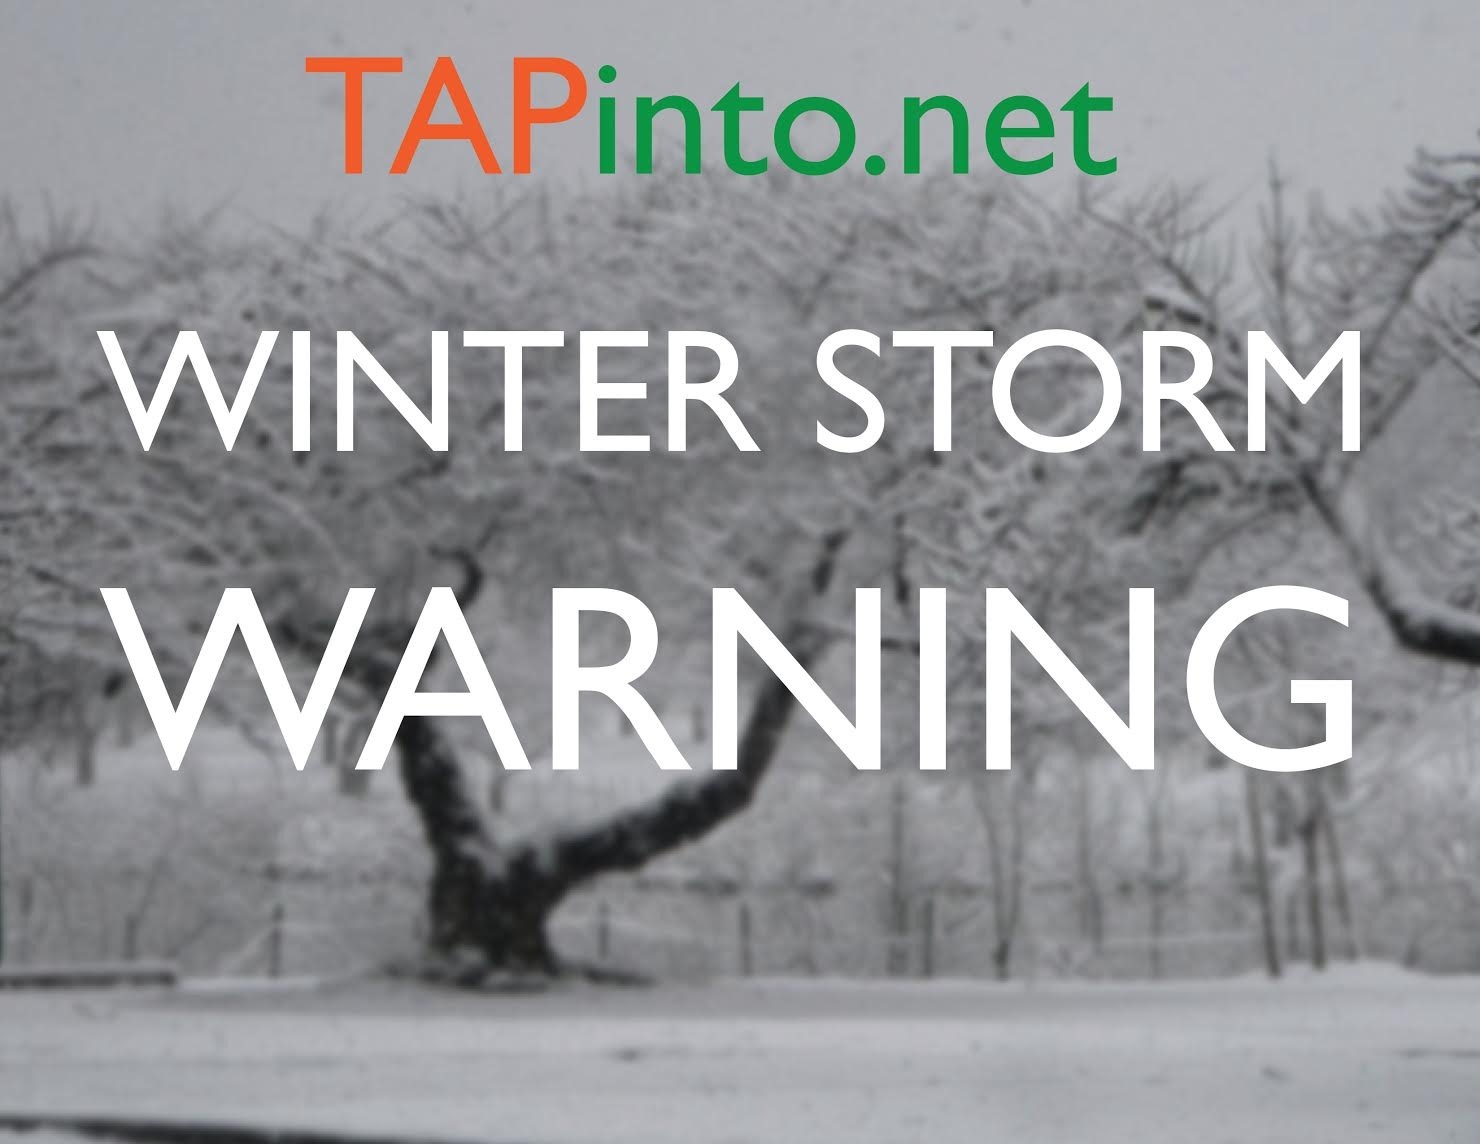 6eeb4f8450b22862596c_winter_storm.jpg